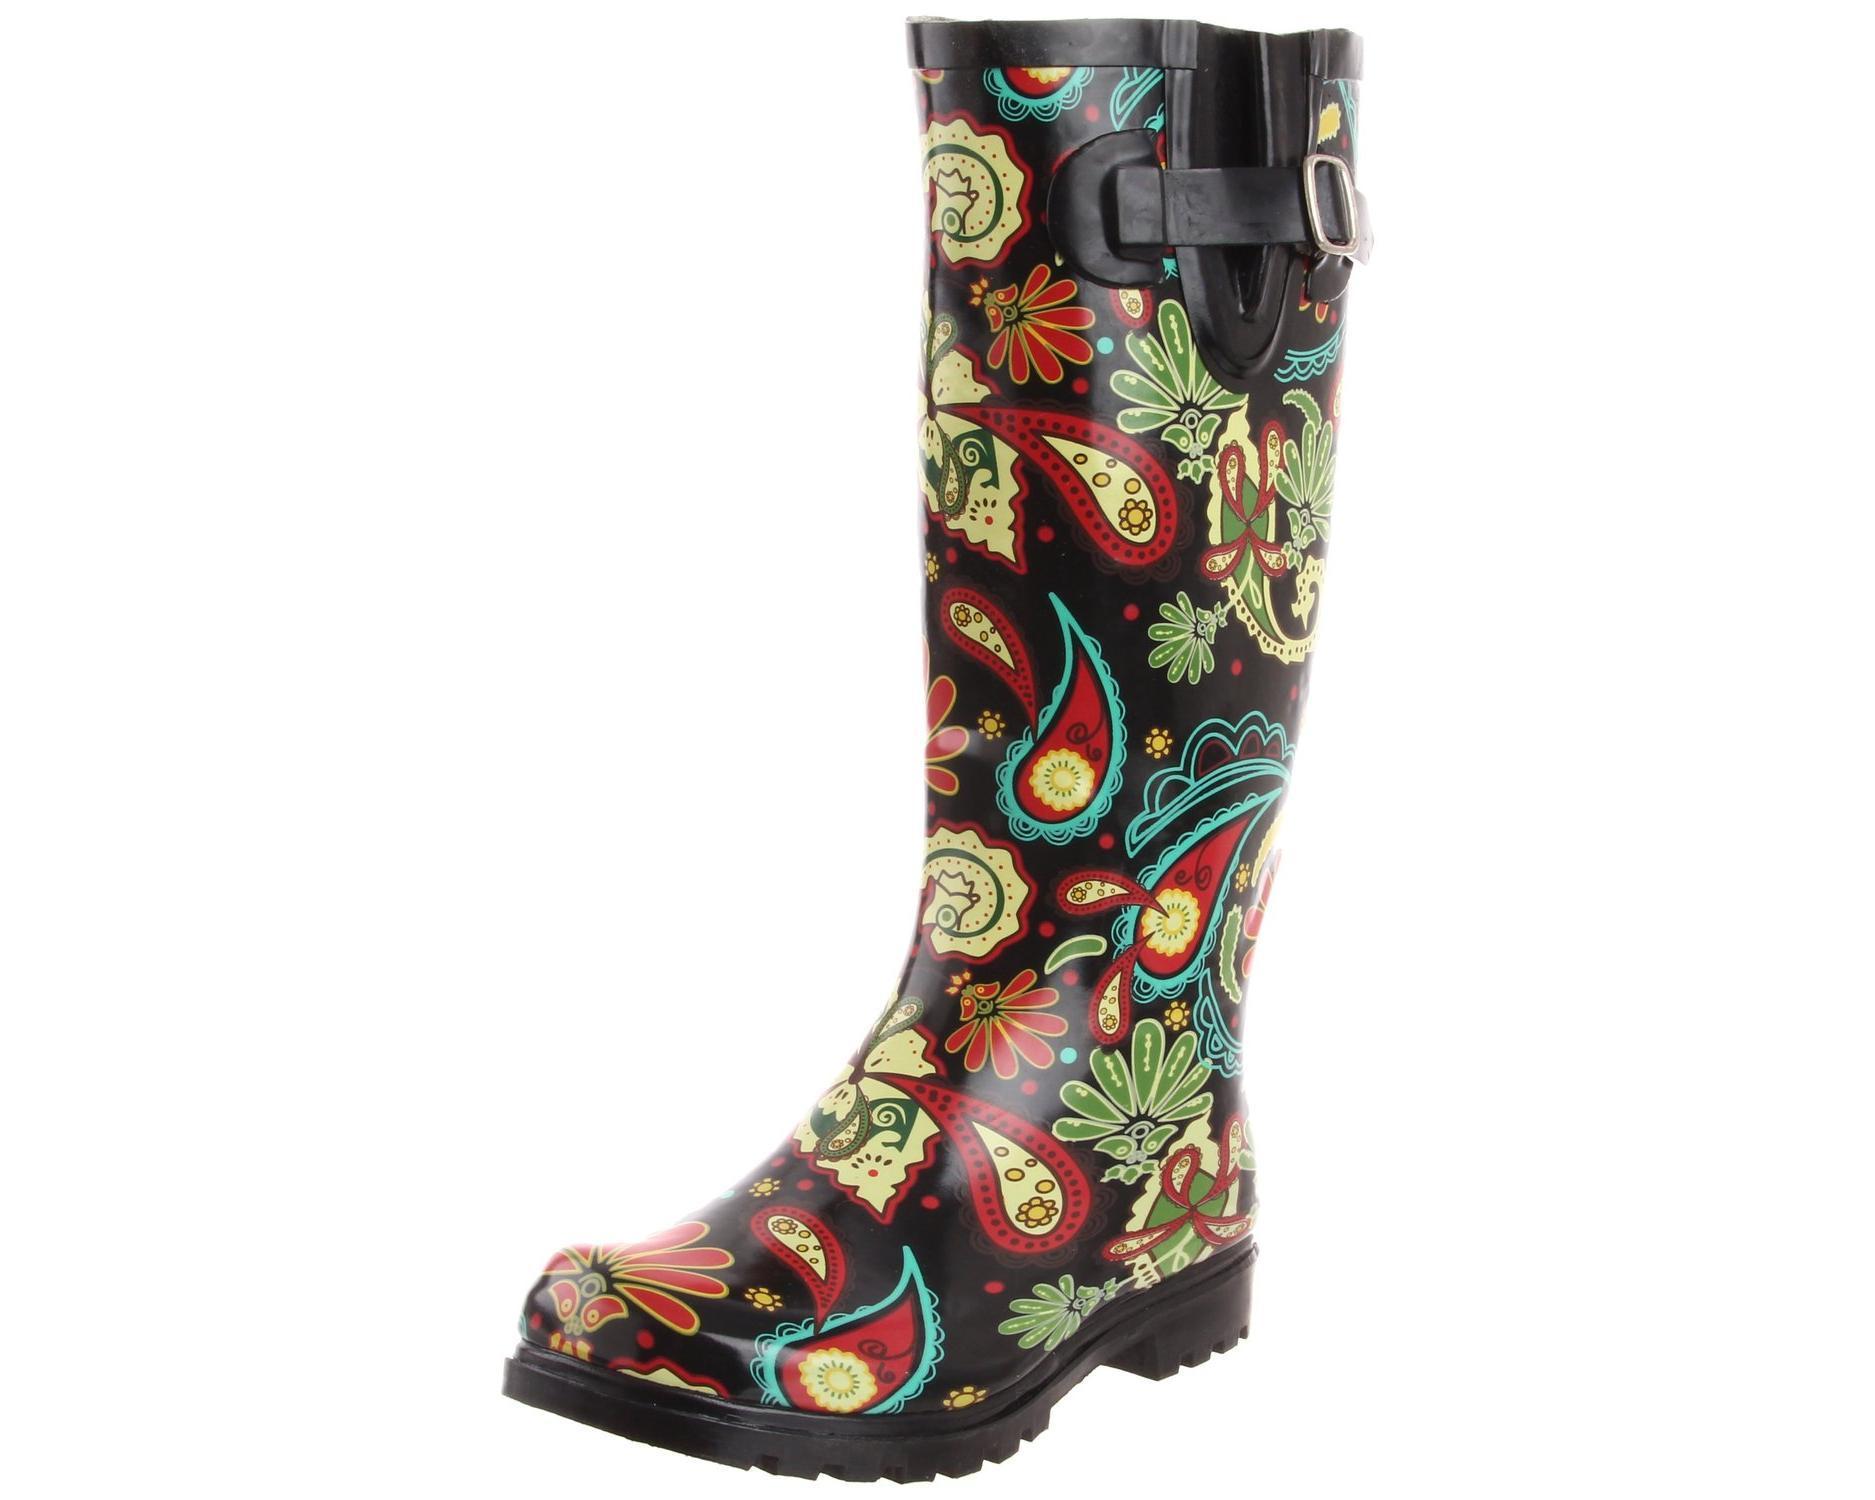 Nomad Paisley Black & Multi Rain Boot by Nomad